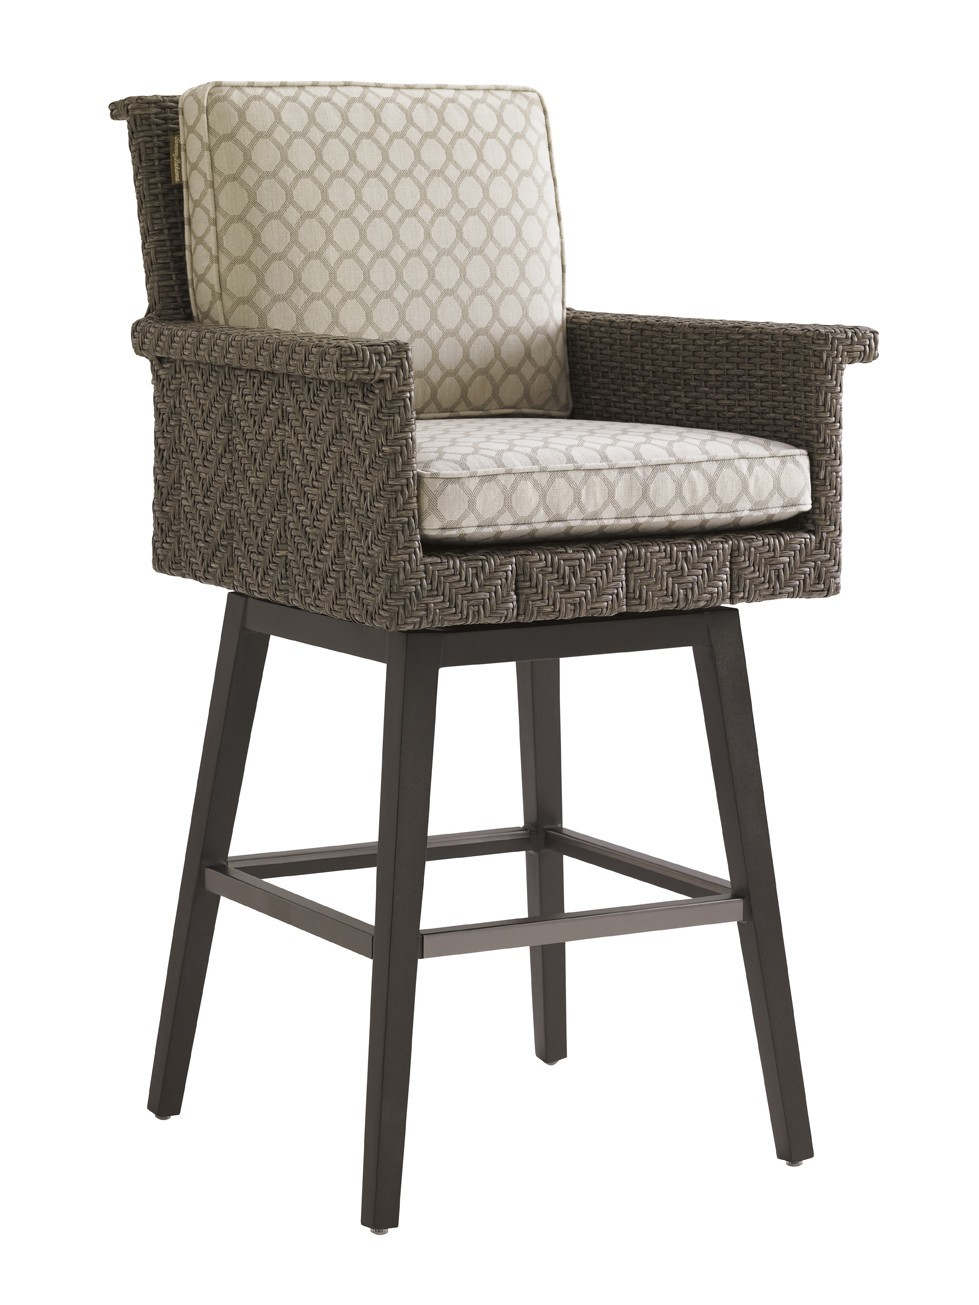 Blue olive swivel bar stool frame hauser s patio